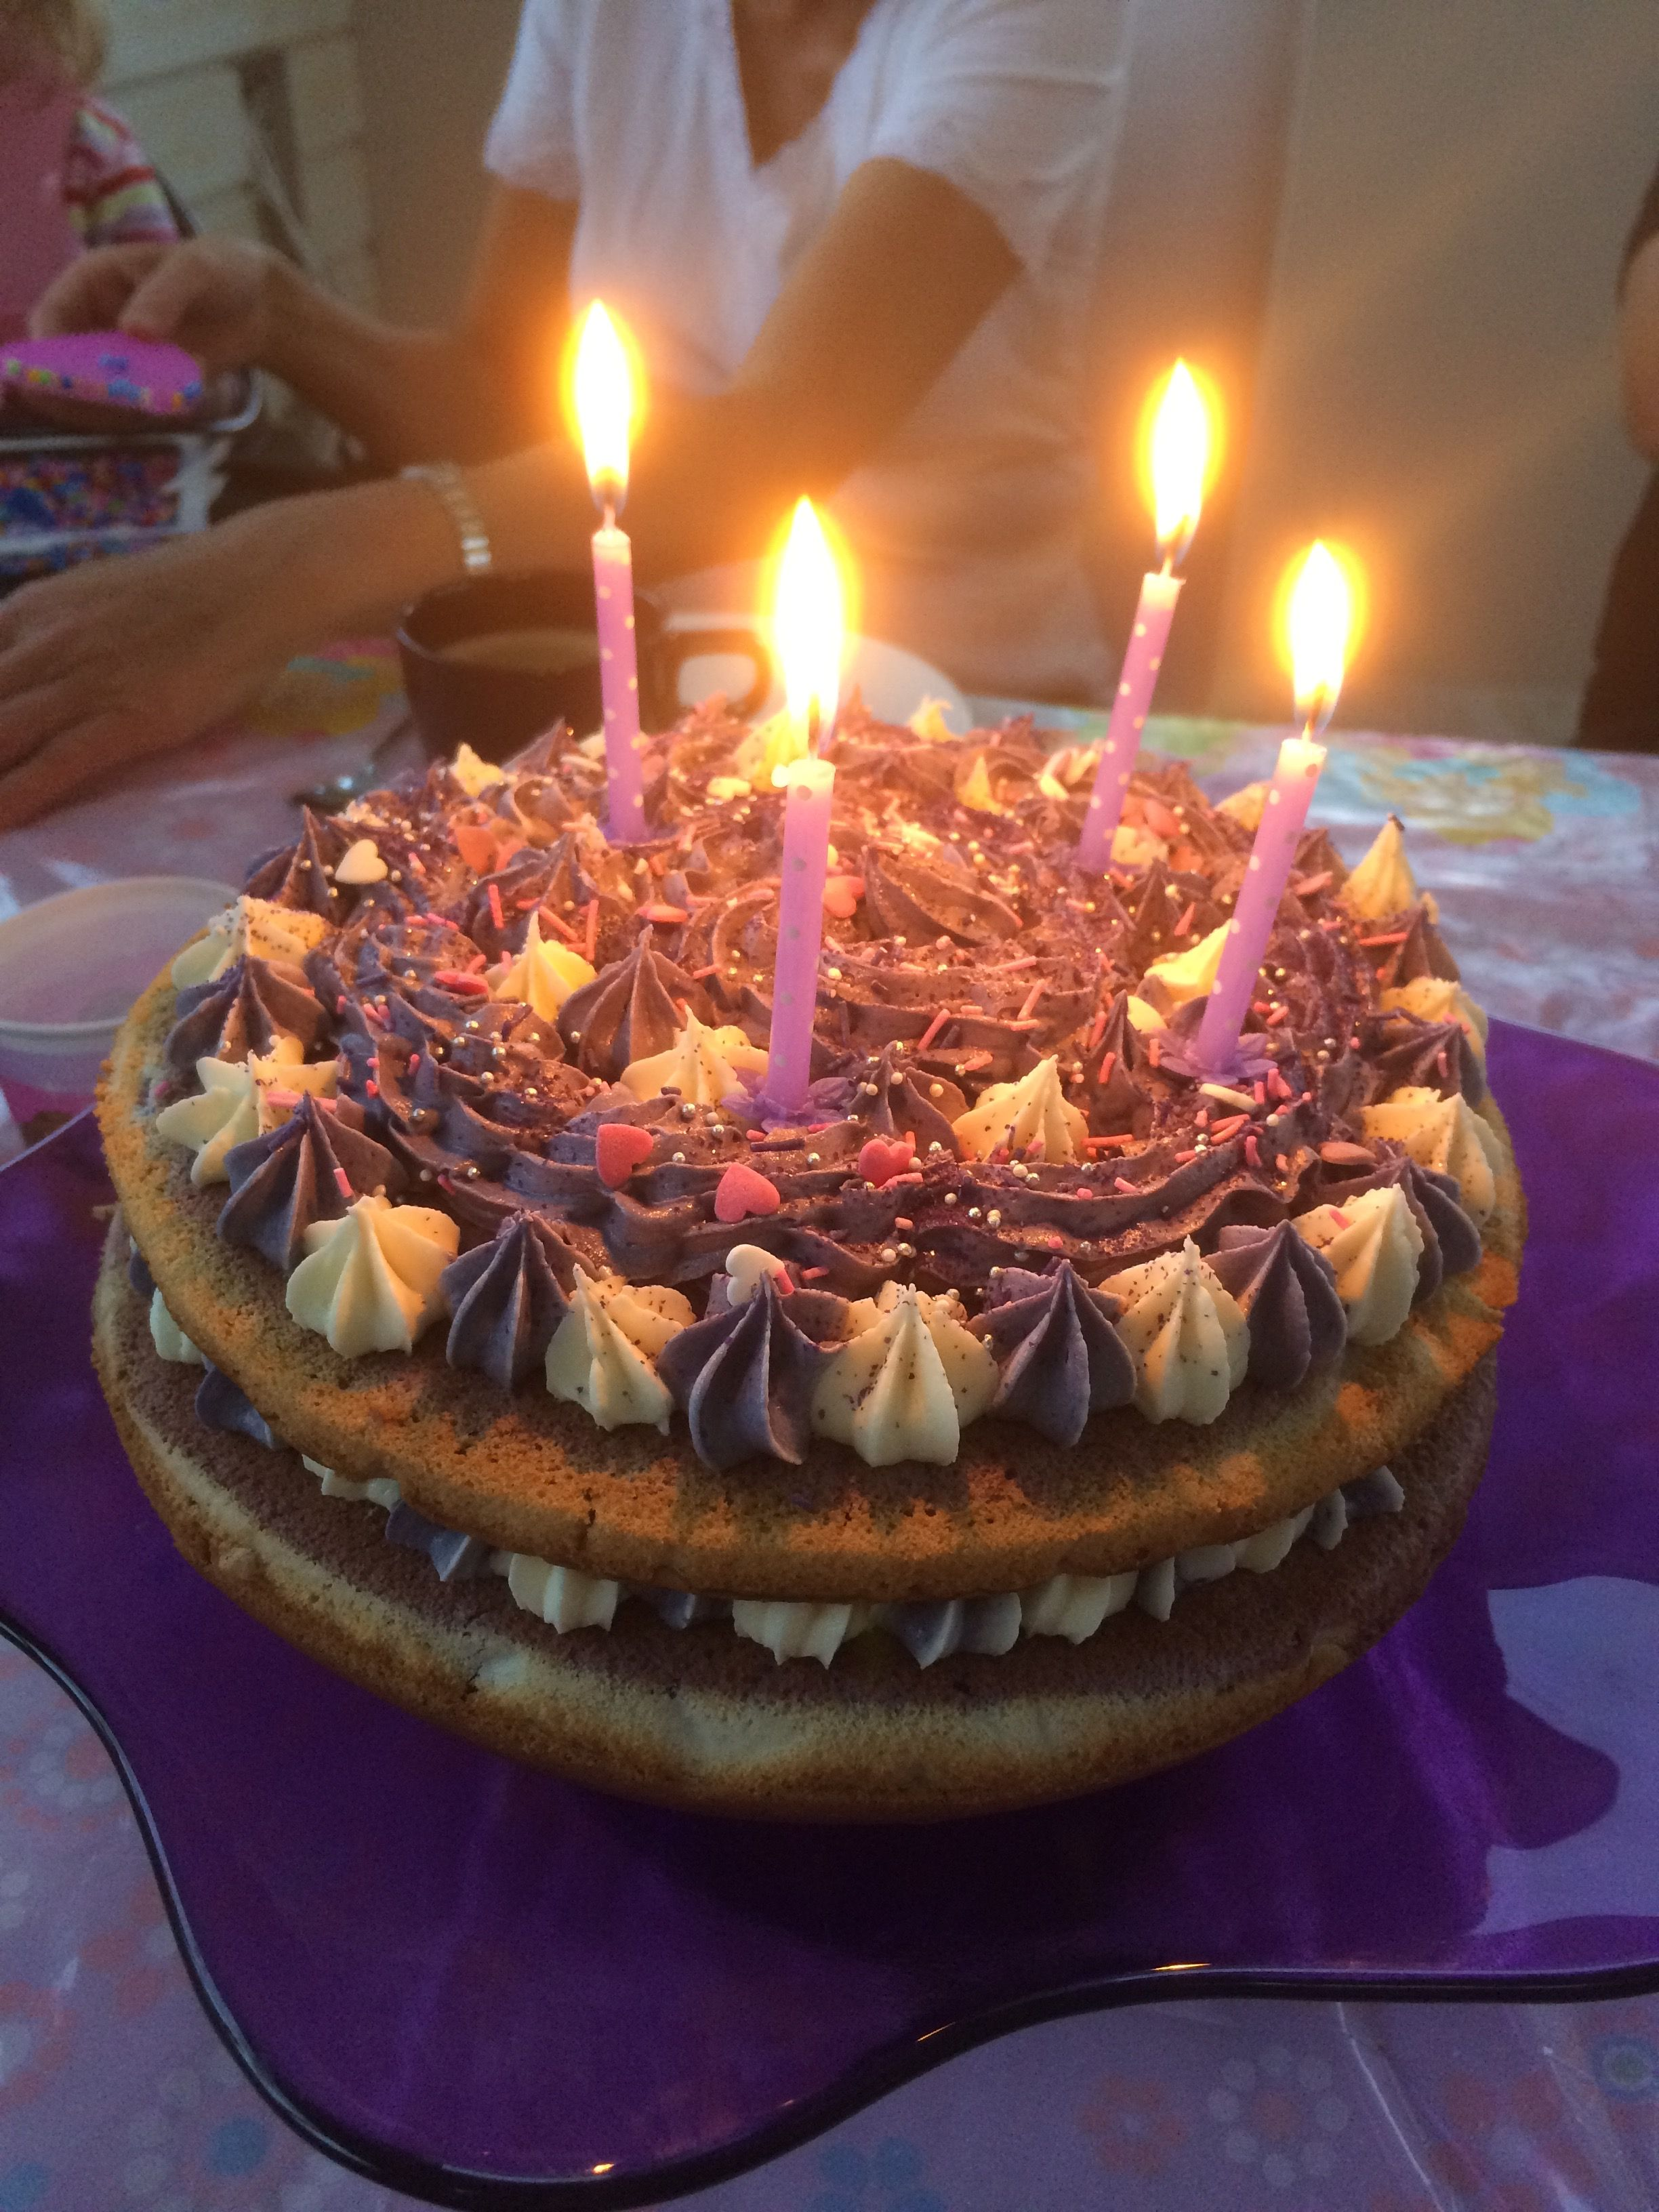 Matilda's 4th birthday cake 1 4th birthday cakes